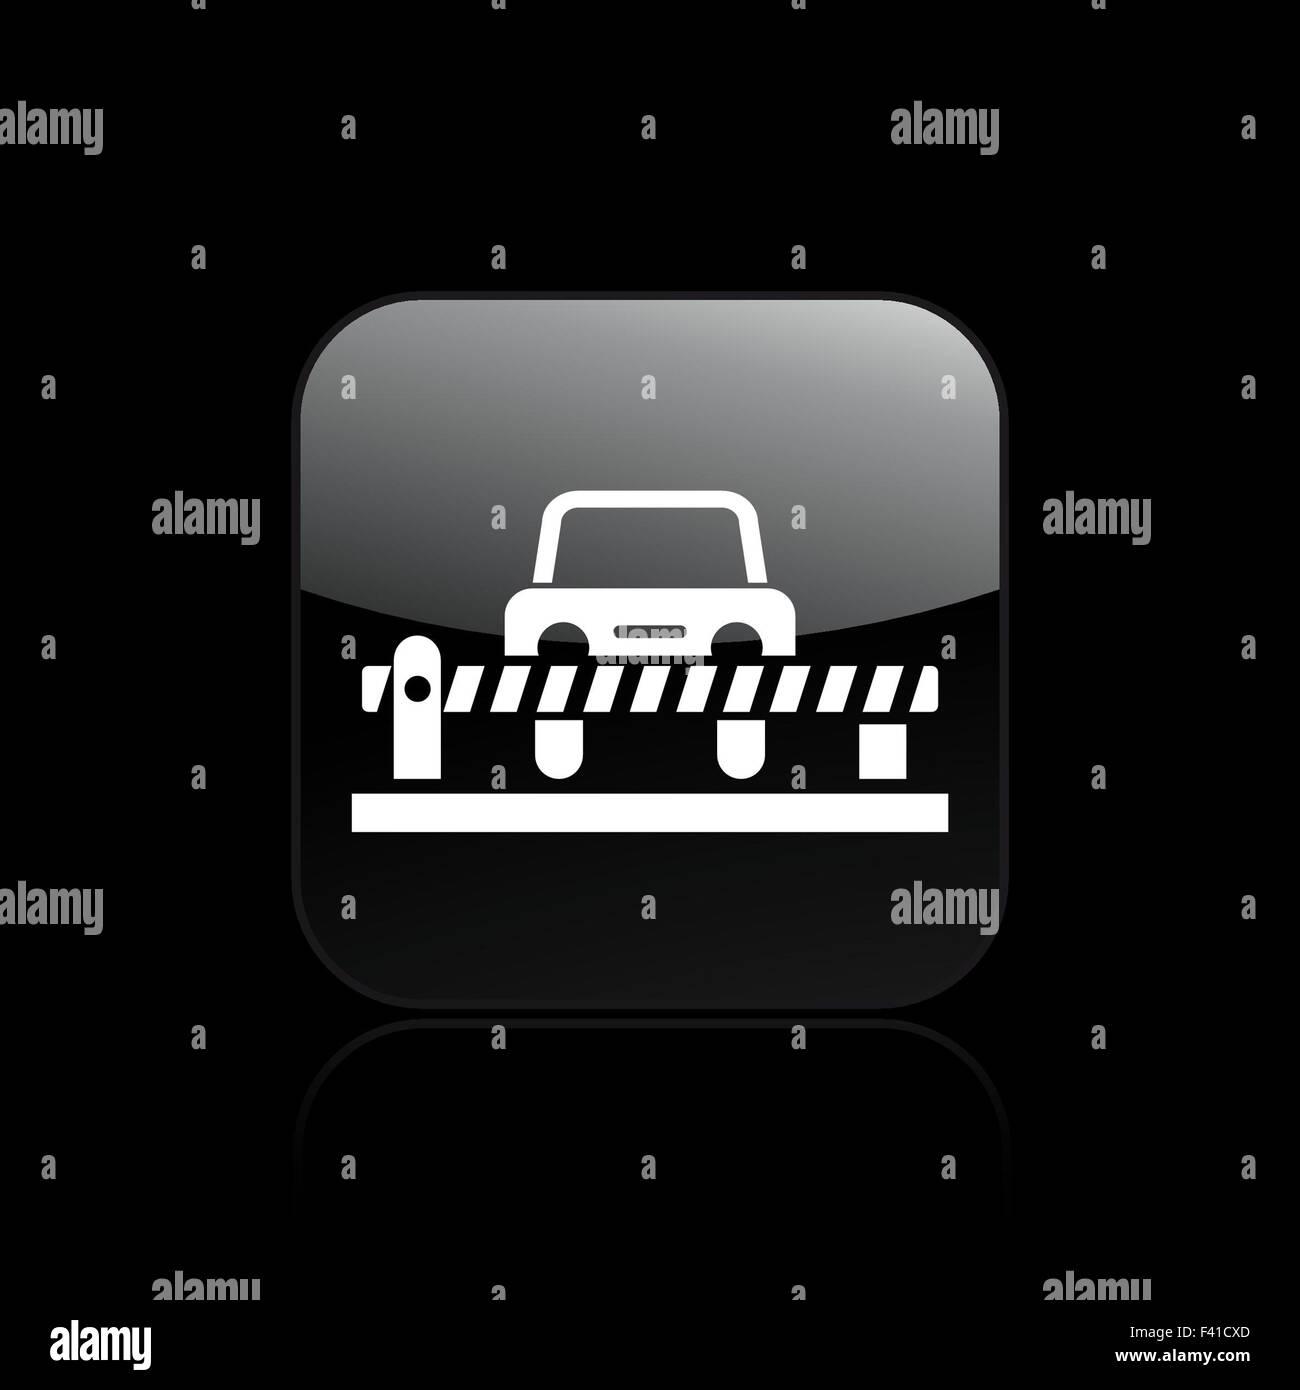 Vector illustration of single bar icon - Stock Image